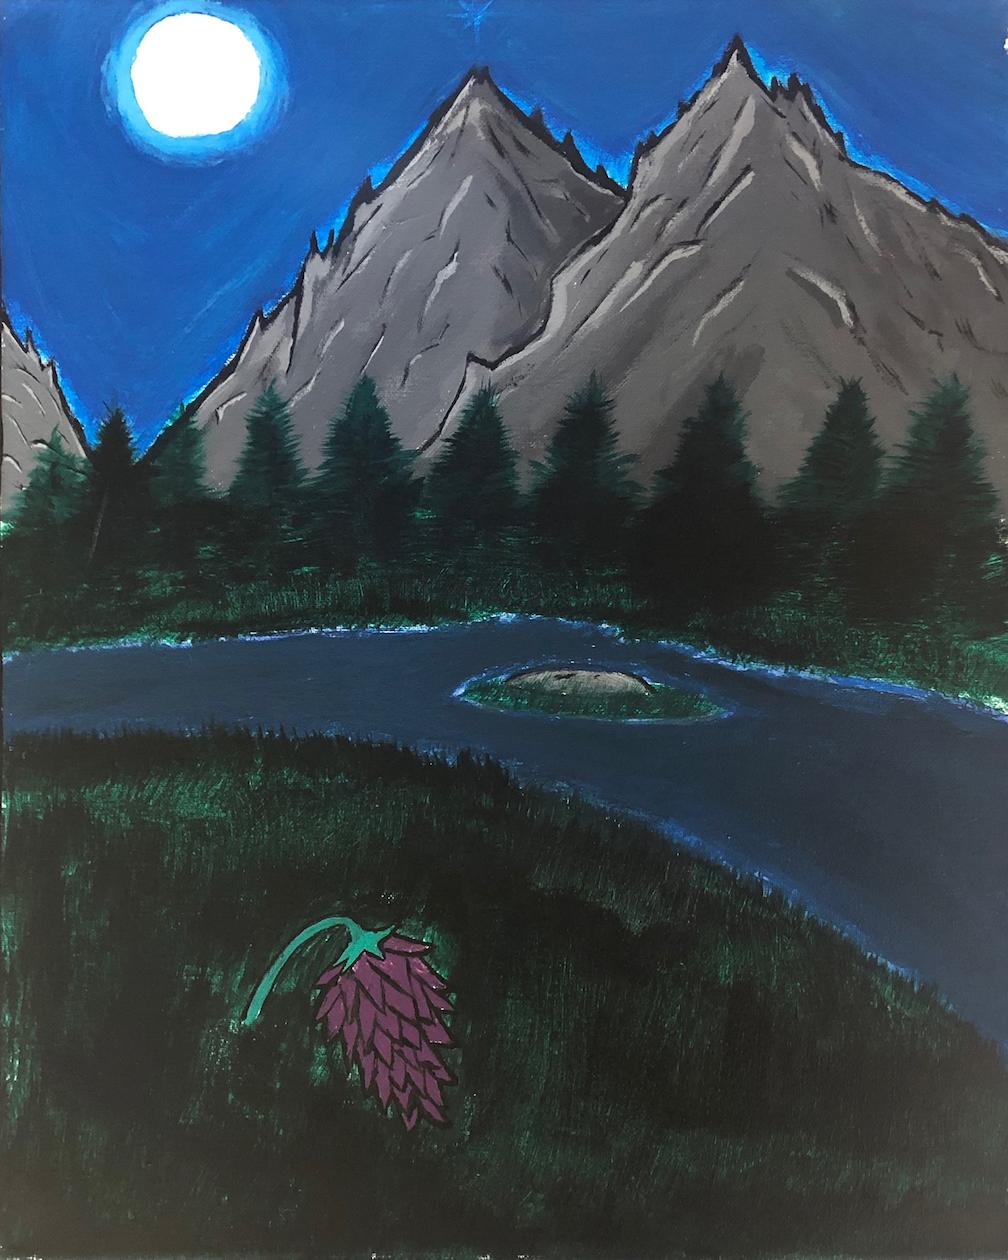 Jerran Begaye: Luna's Sky